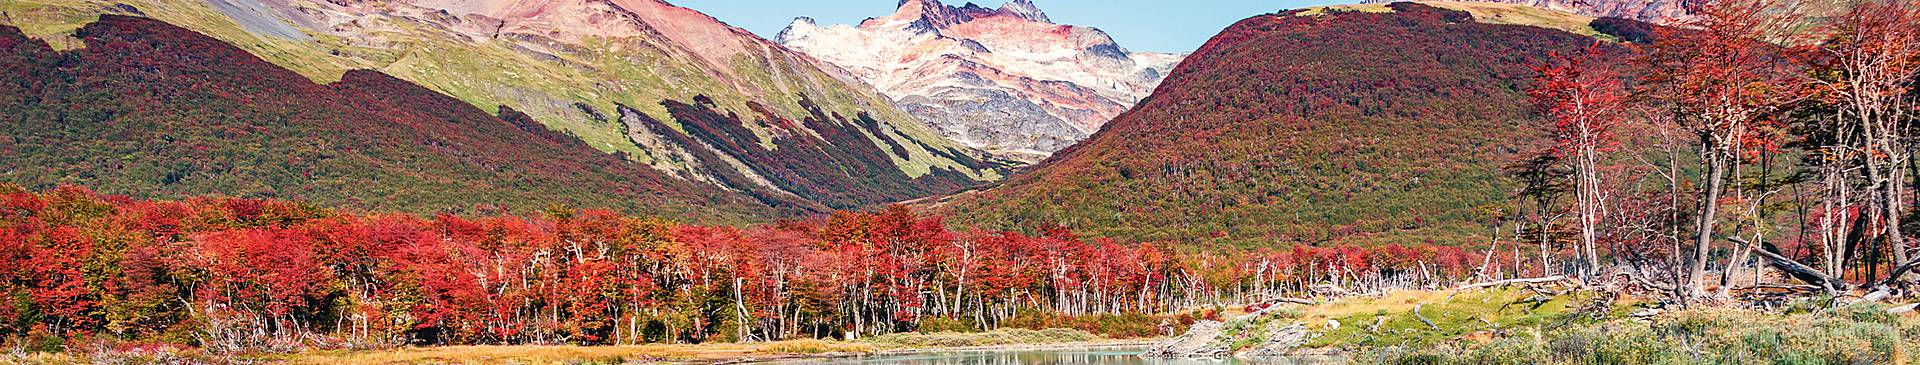 Una settimana in Argentina